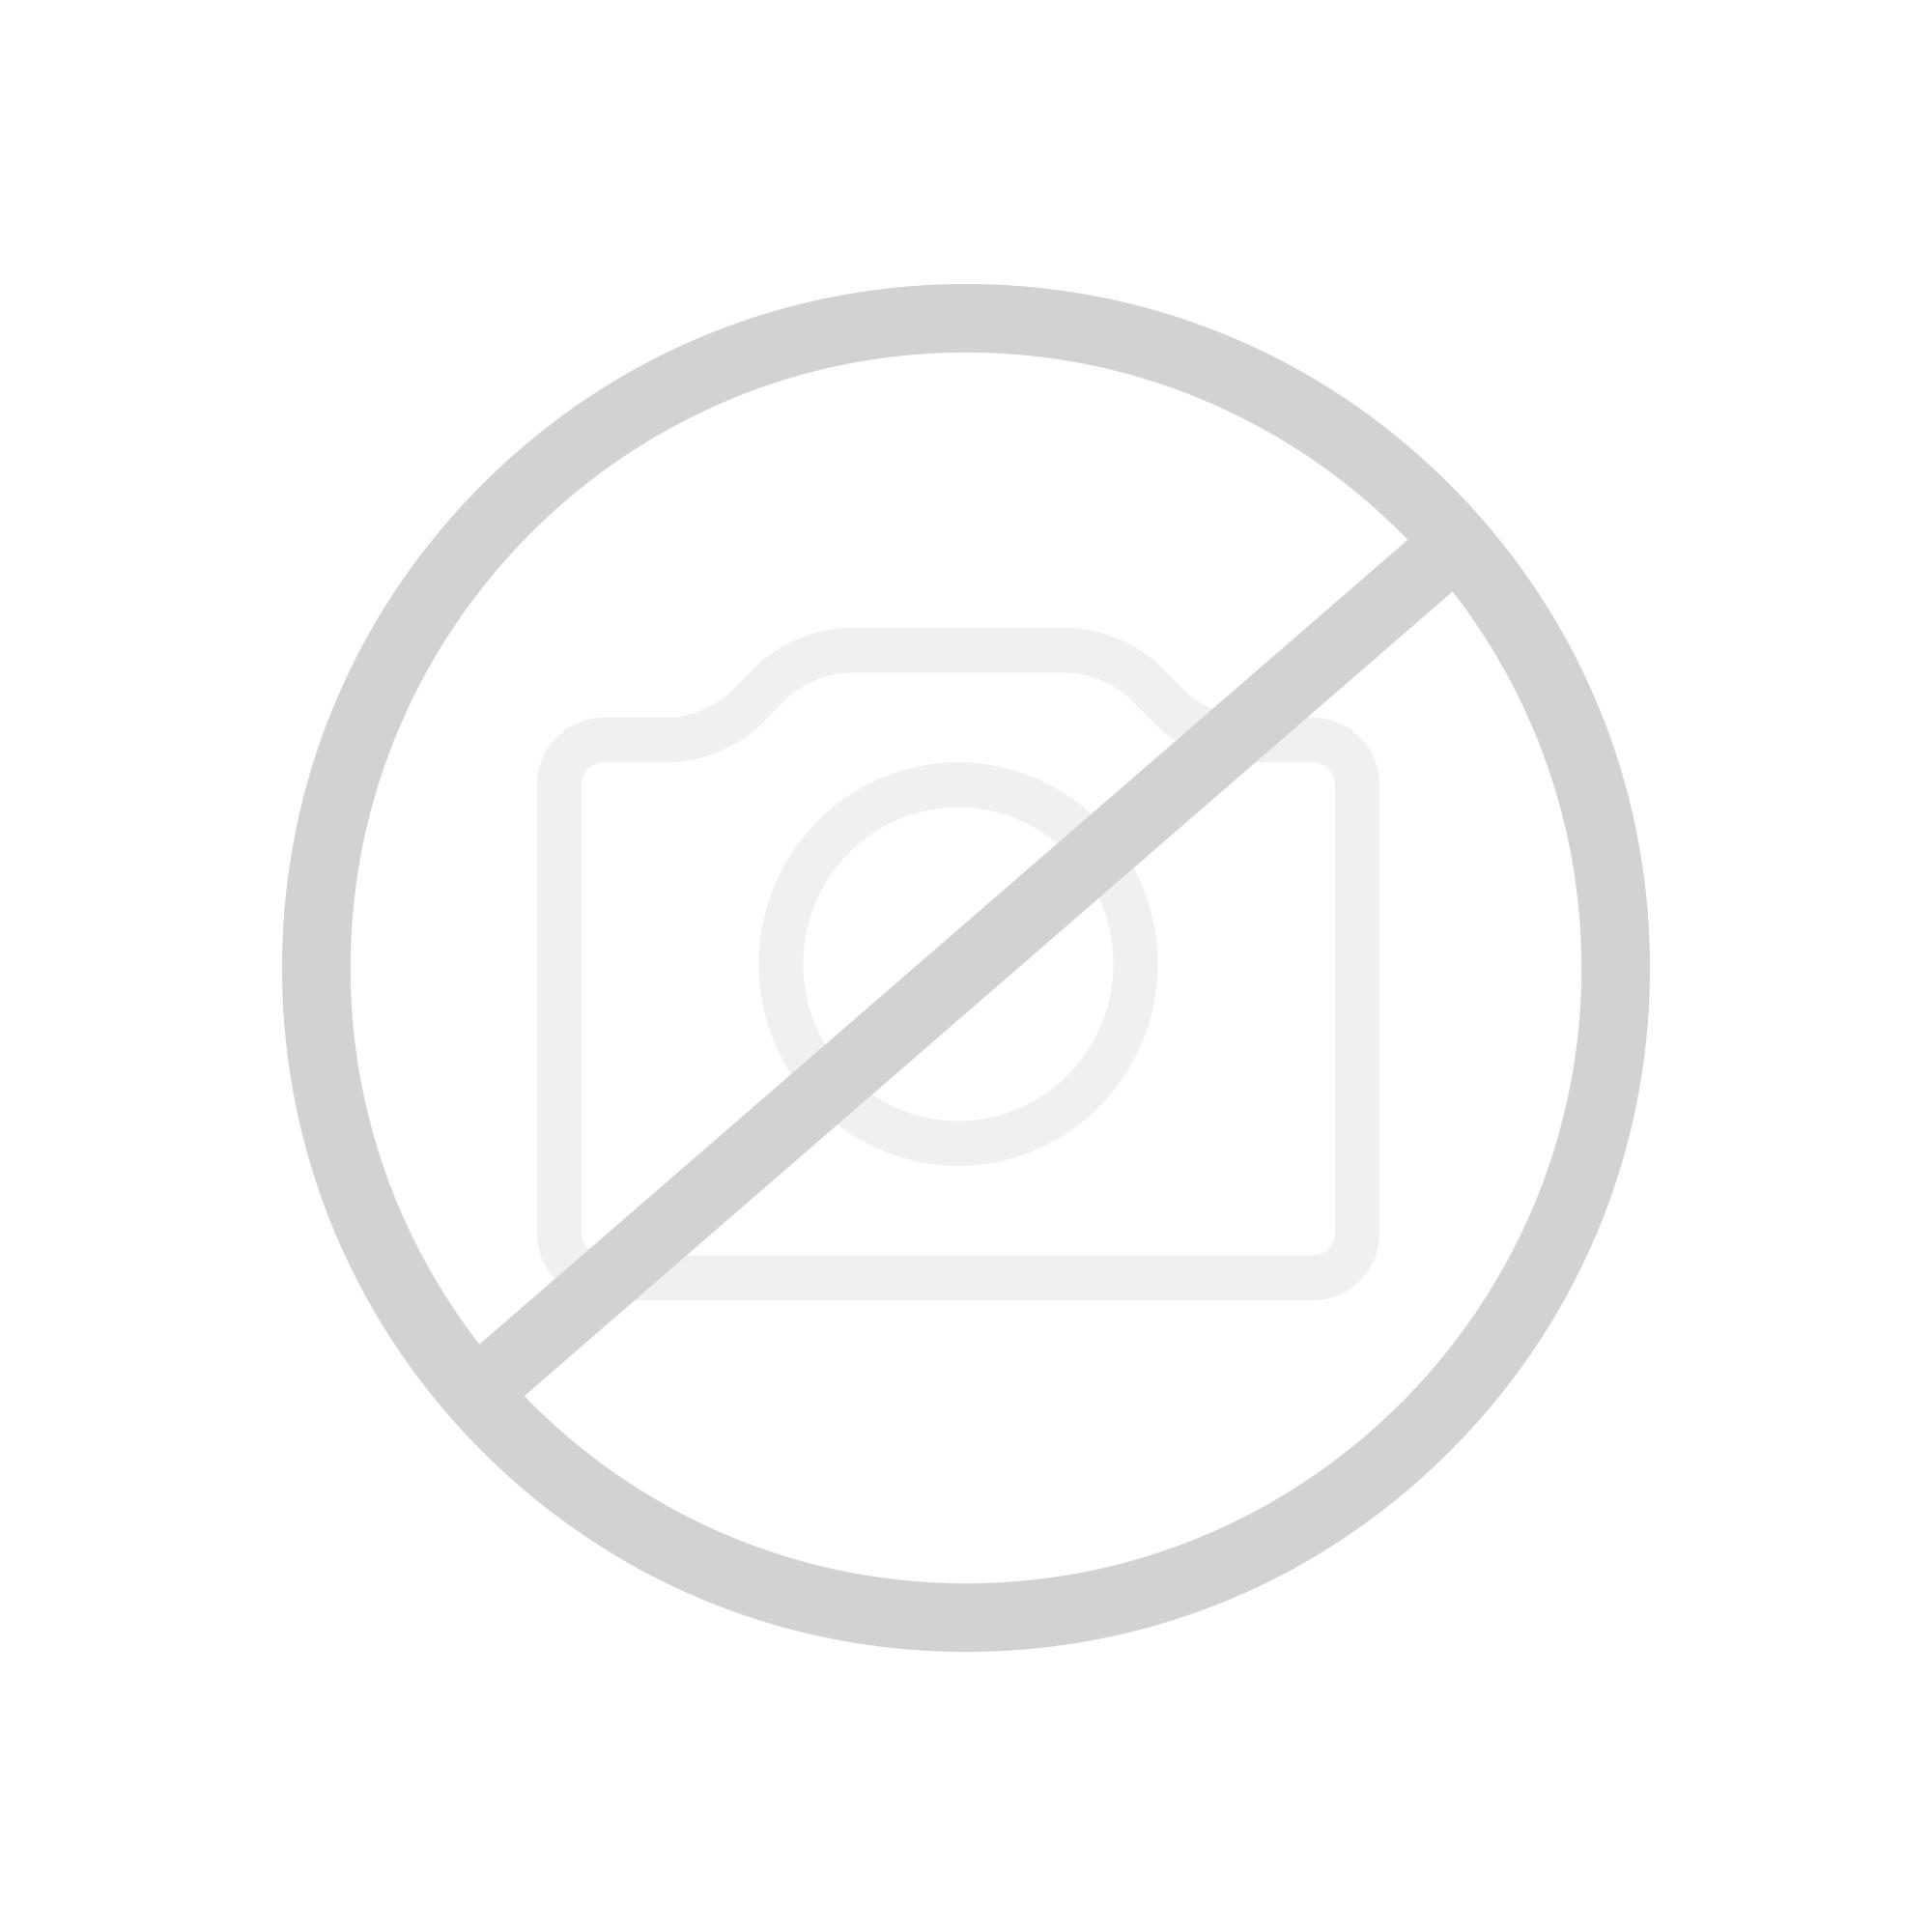 Emco Touch slim Möbelanlage optiwhite/chrom